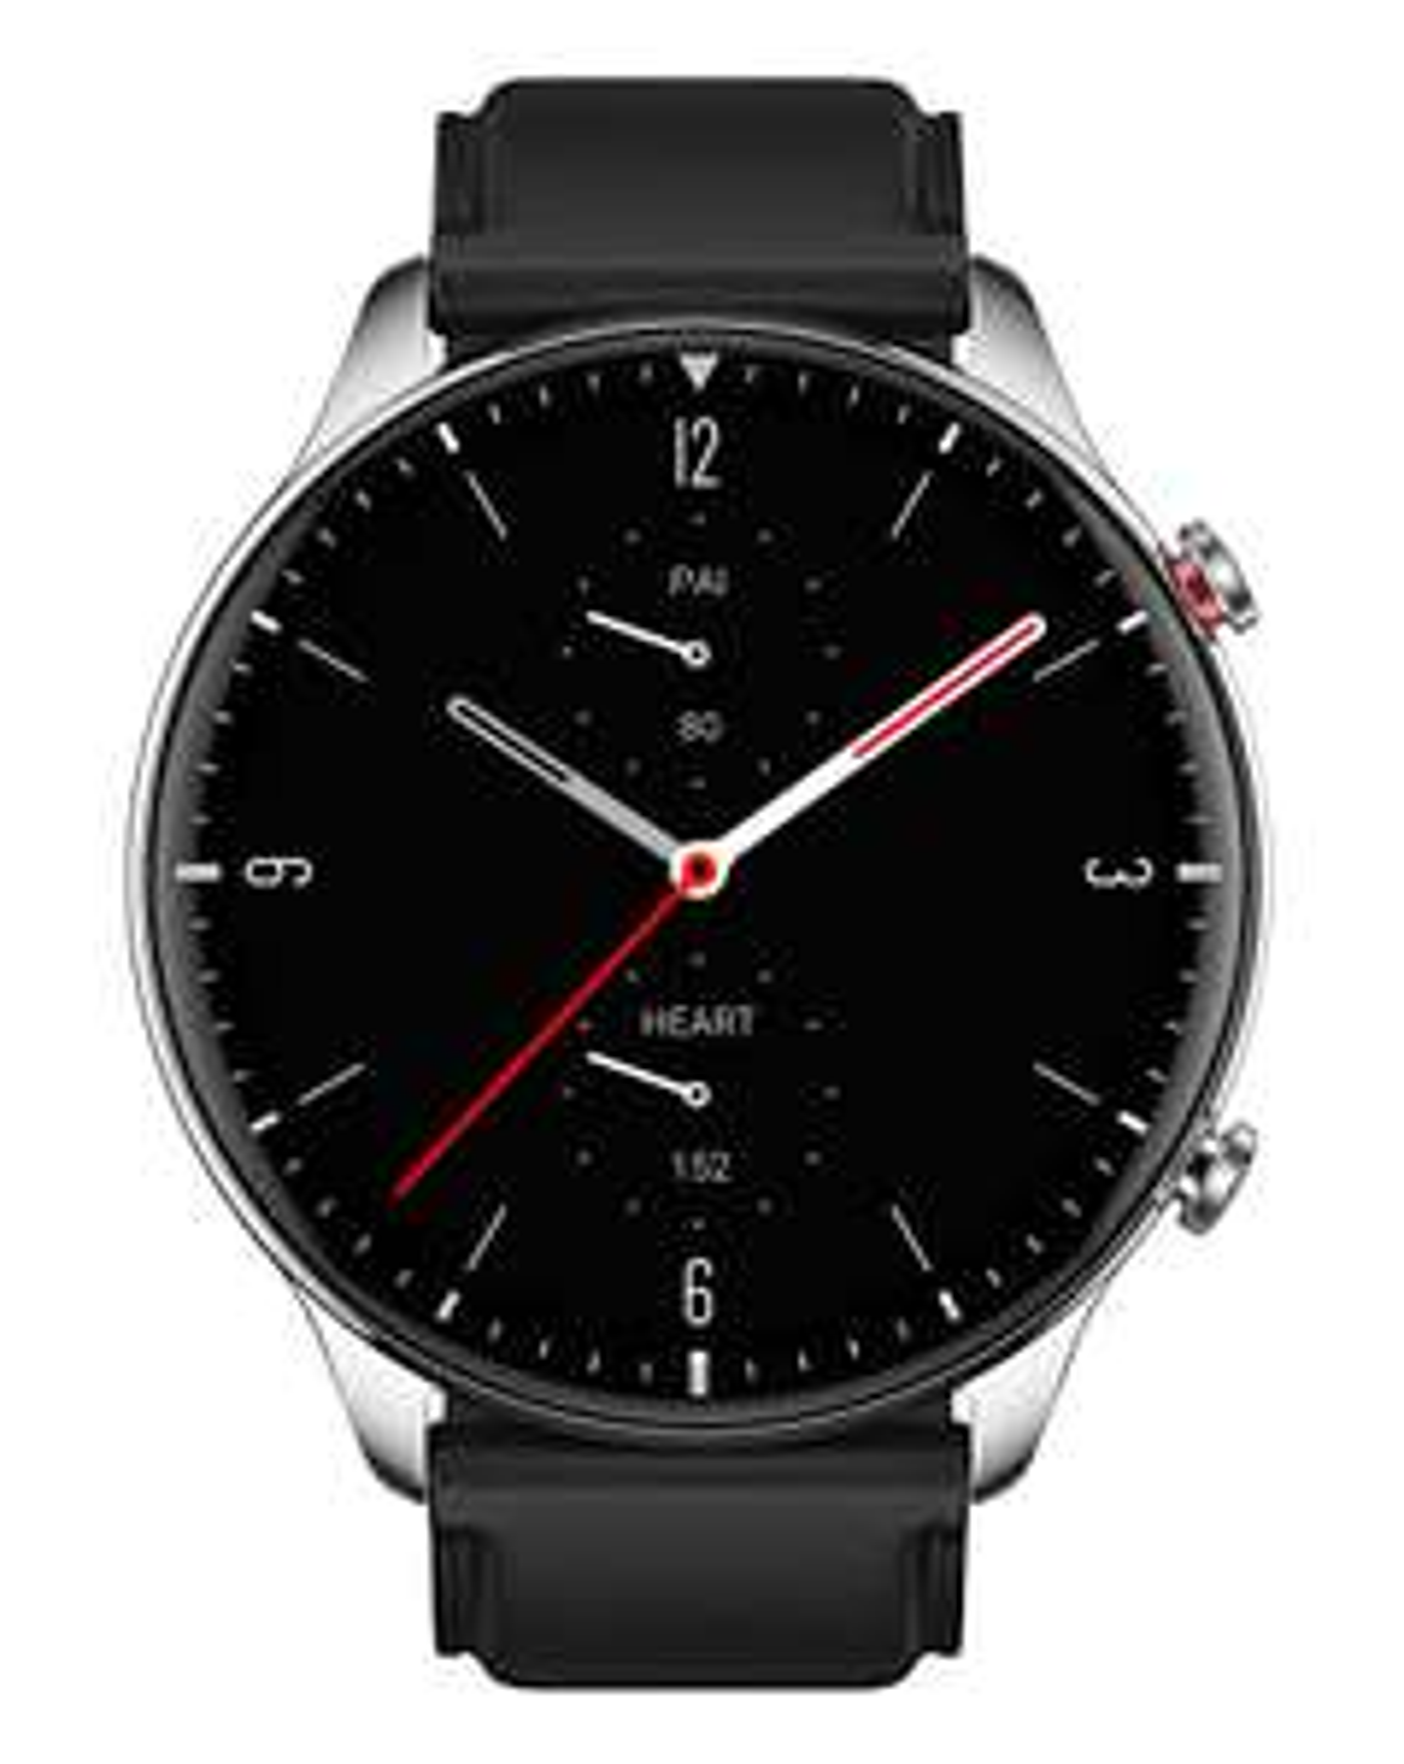 Amazfit GTR 2 Smart Watch - £99 + £2.95 Delivery @ Jacamo